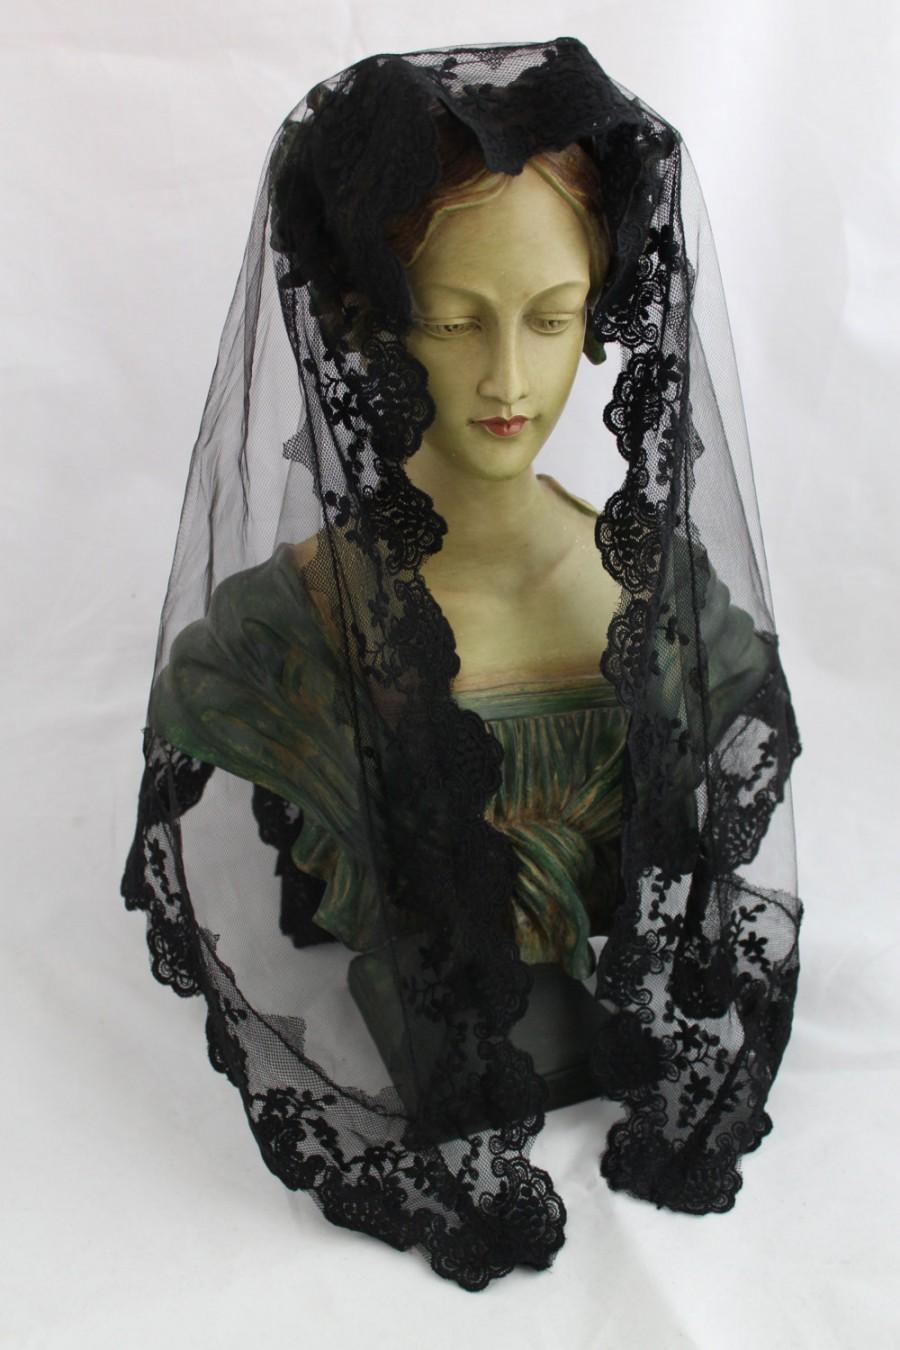 Hochzeit - Traditional Mantilla / Long Triangle Chapel Veil / Triangular Veil /  Catholic Headcovering / Veil for Mass / The Marcella Veil.